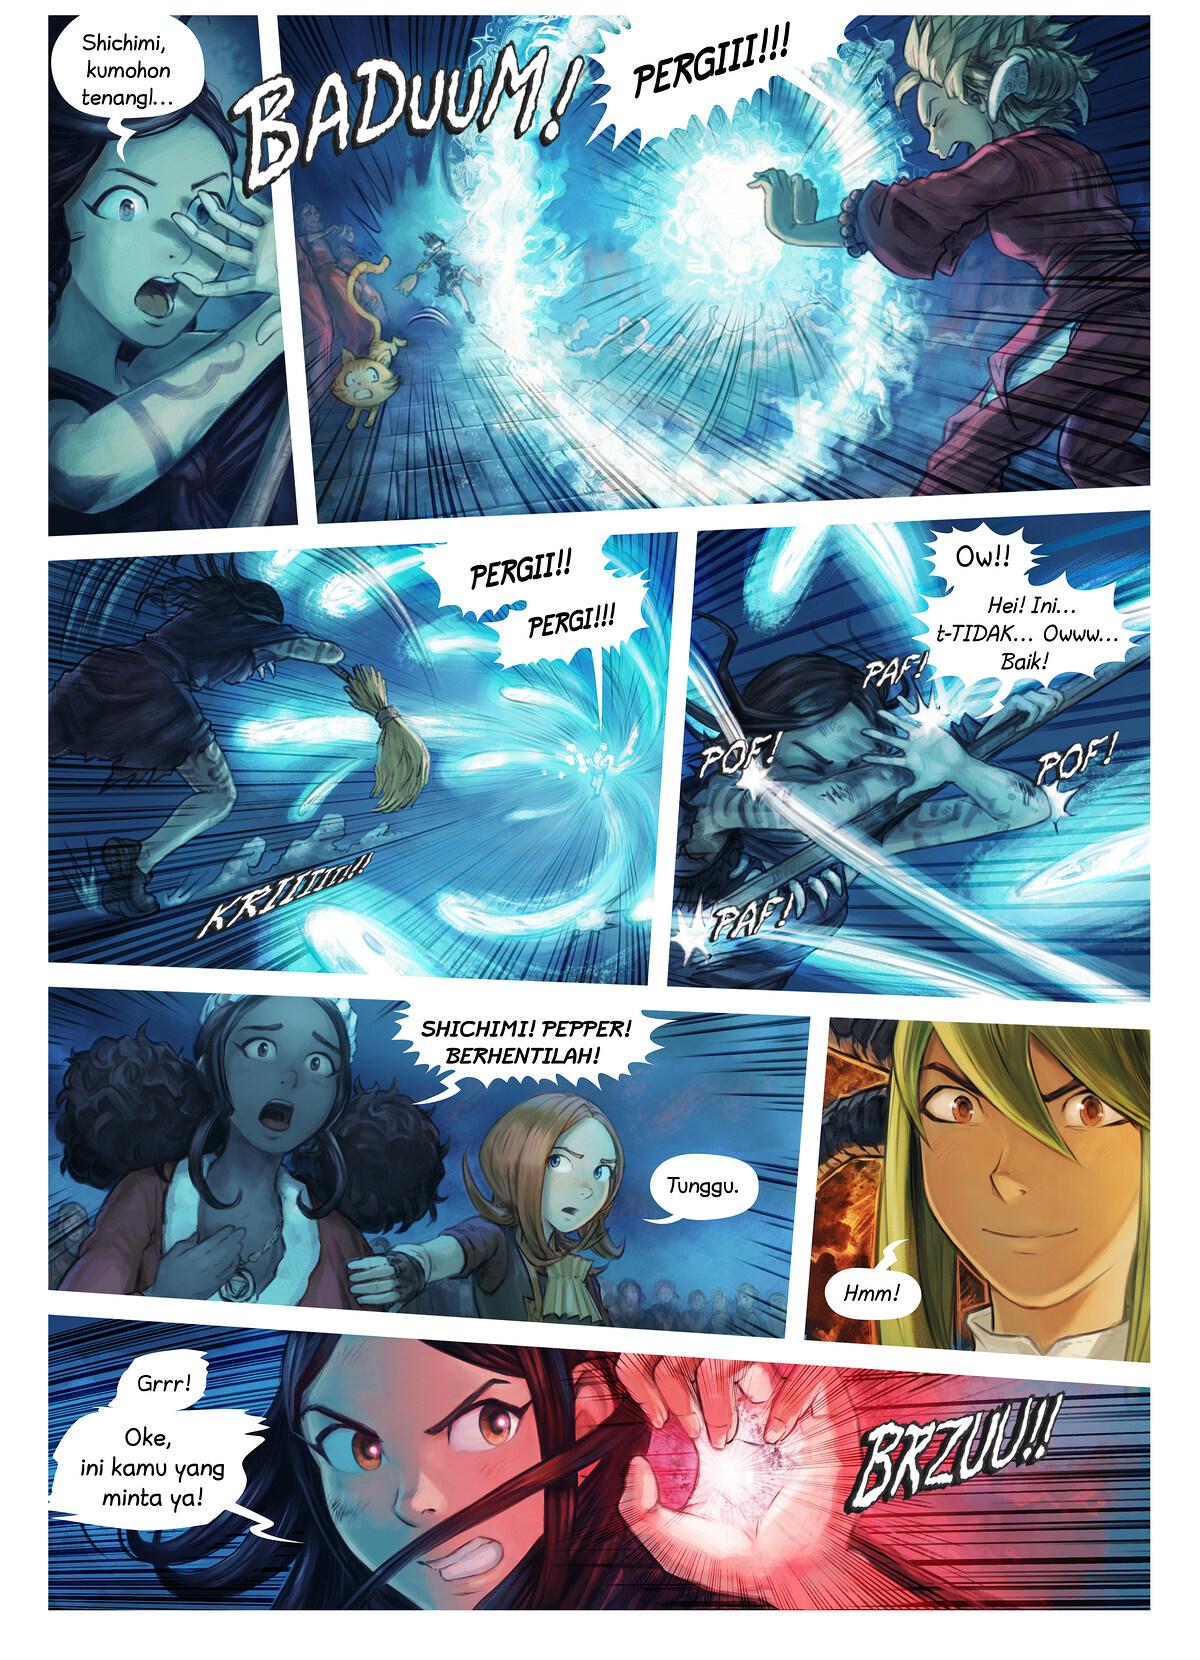 Episode 34: Pemberian Gelar Ksatria Shichimi, Page 6